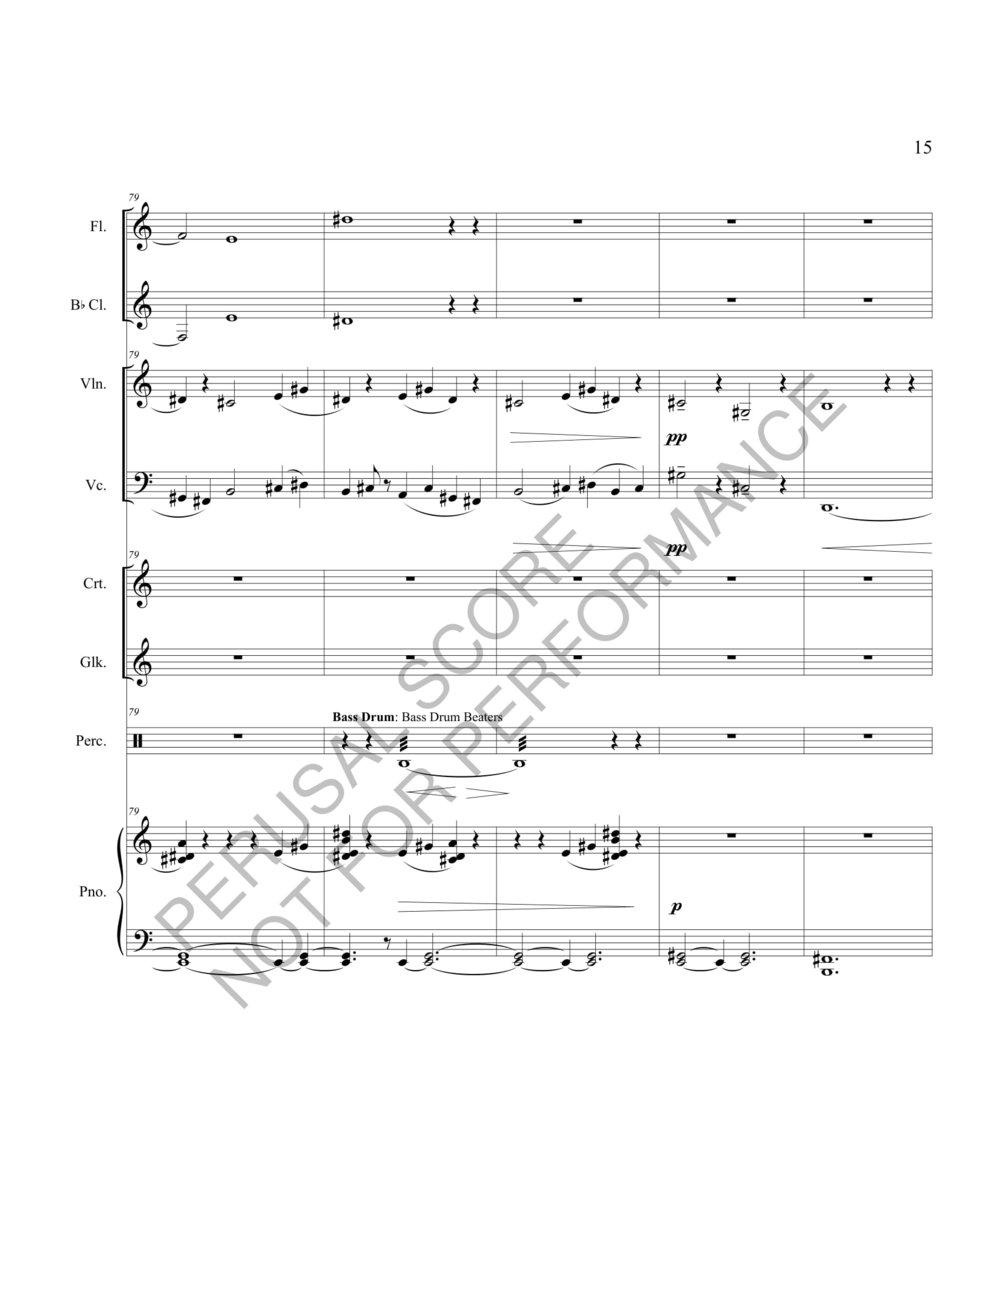 Boyd Terra Liberi Score-watermark-21.jpg